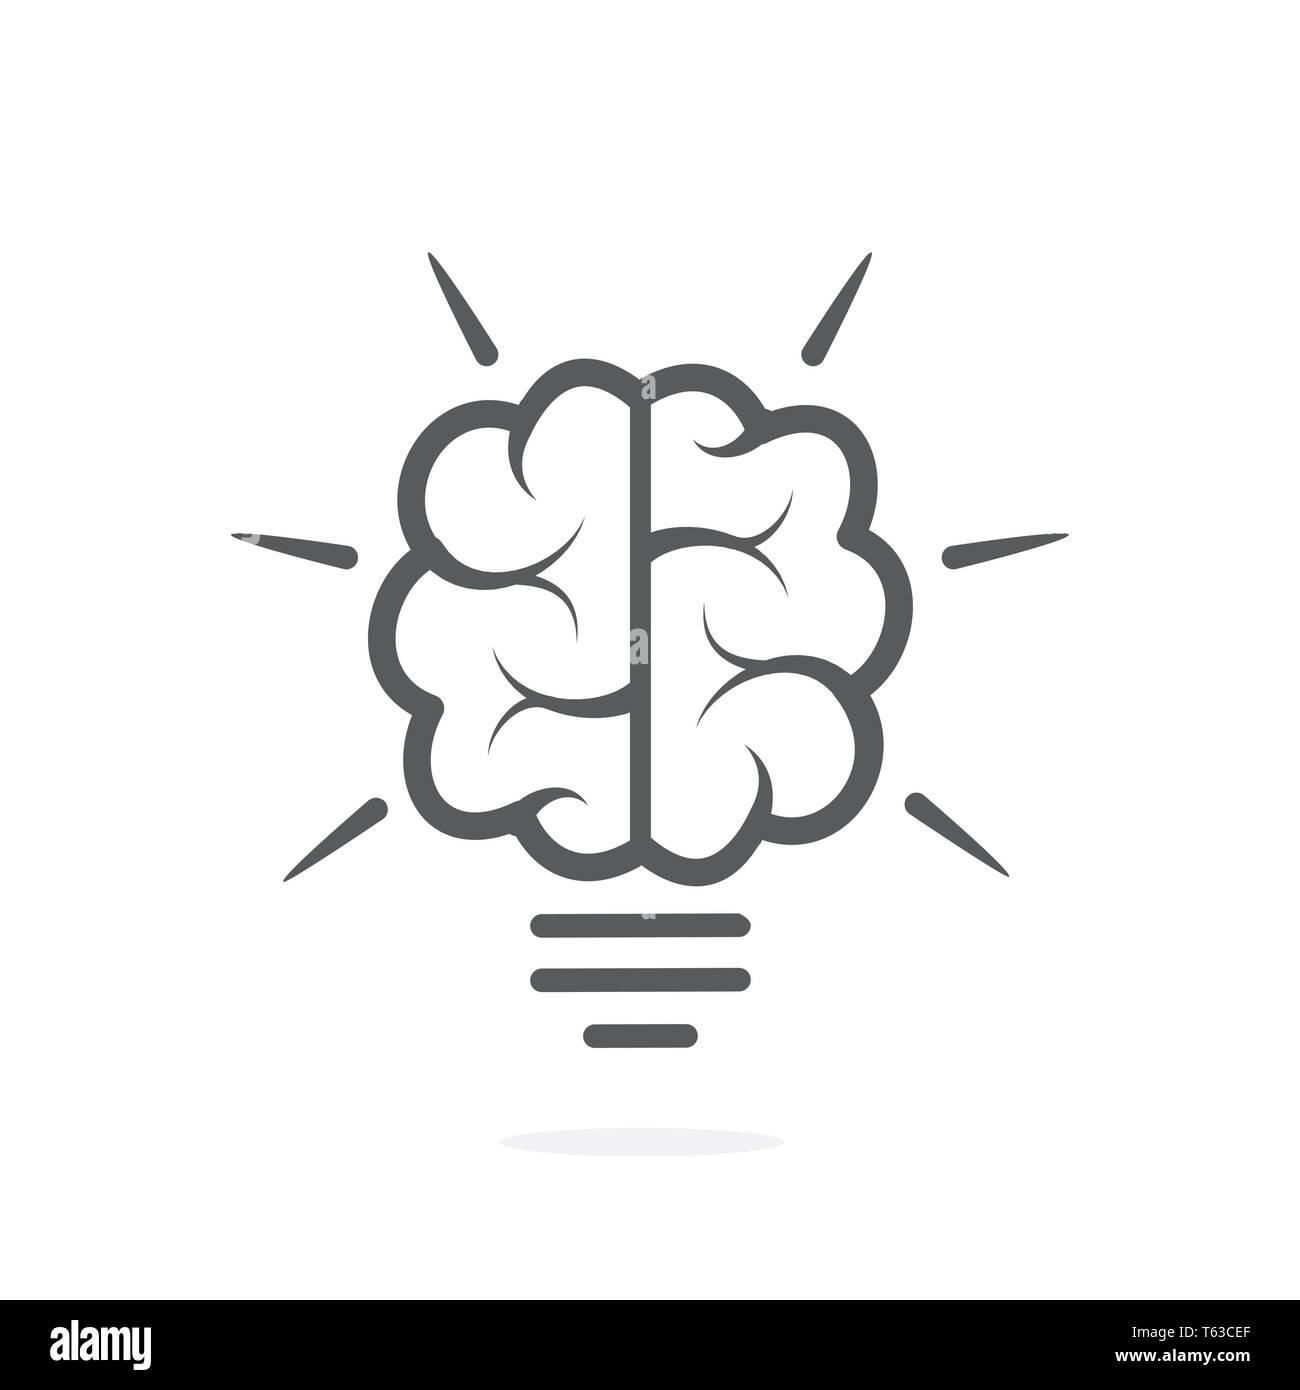 Knowledge icon on white background - Stock Image